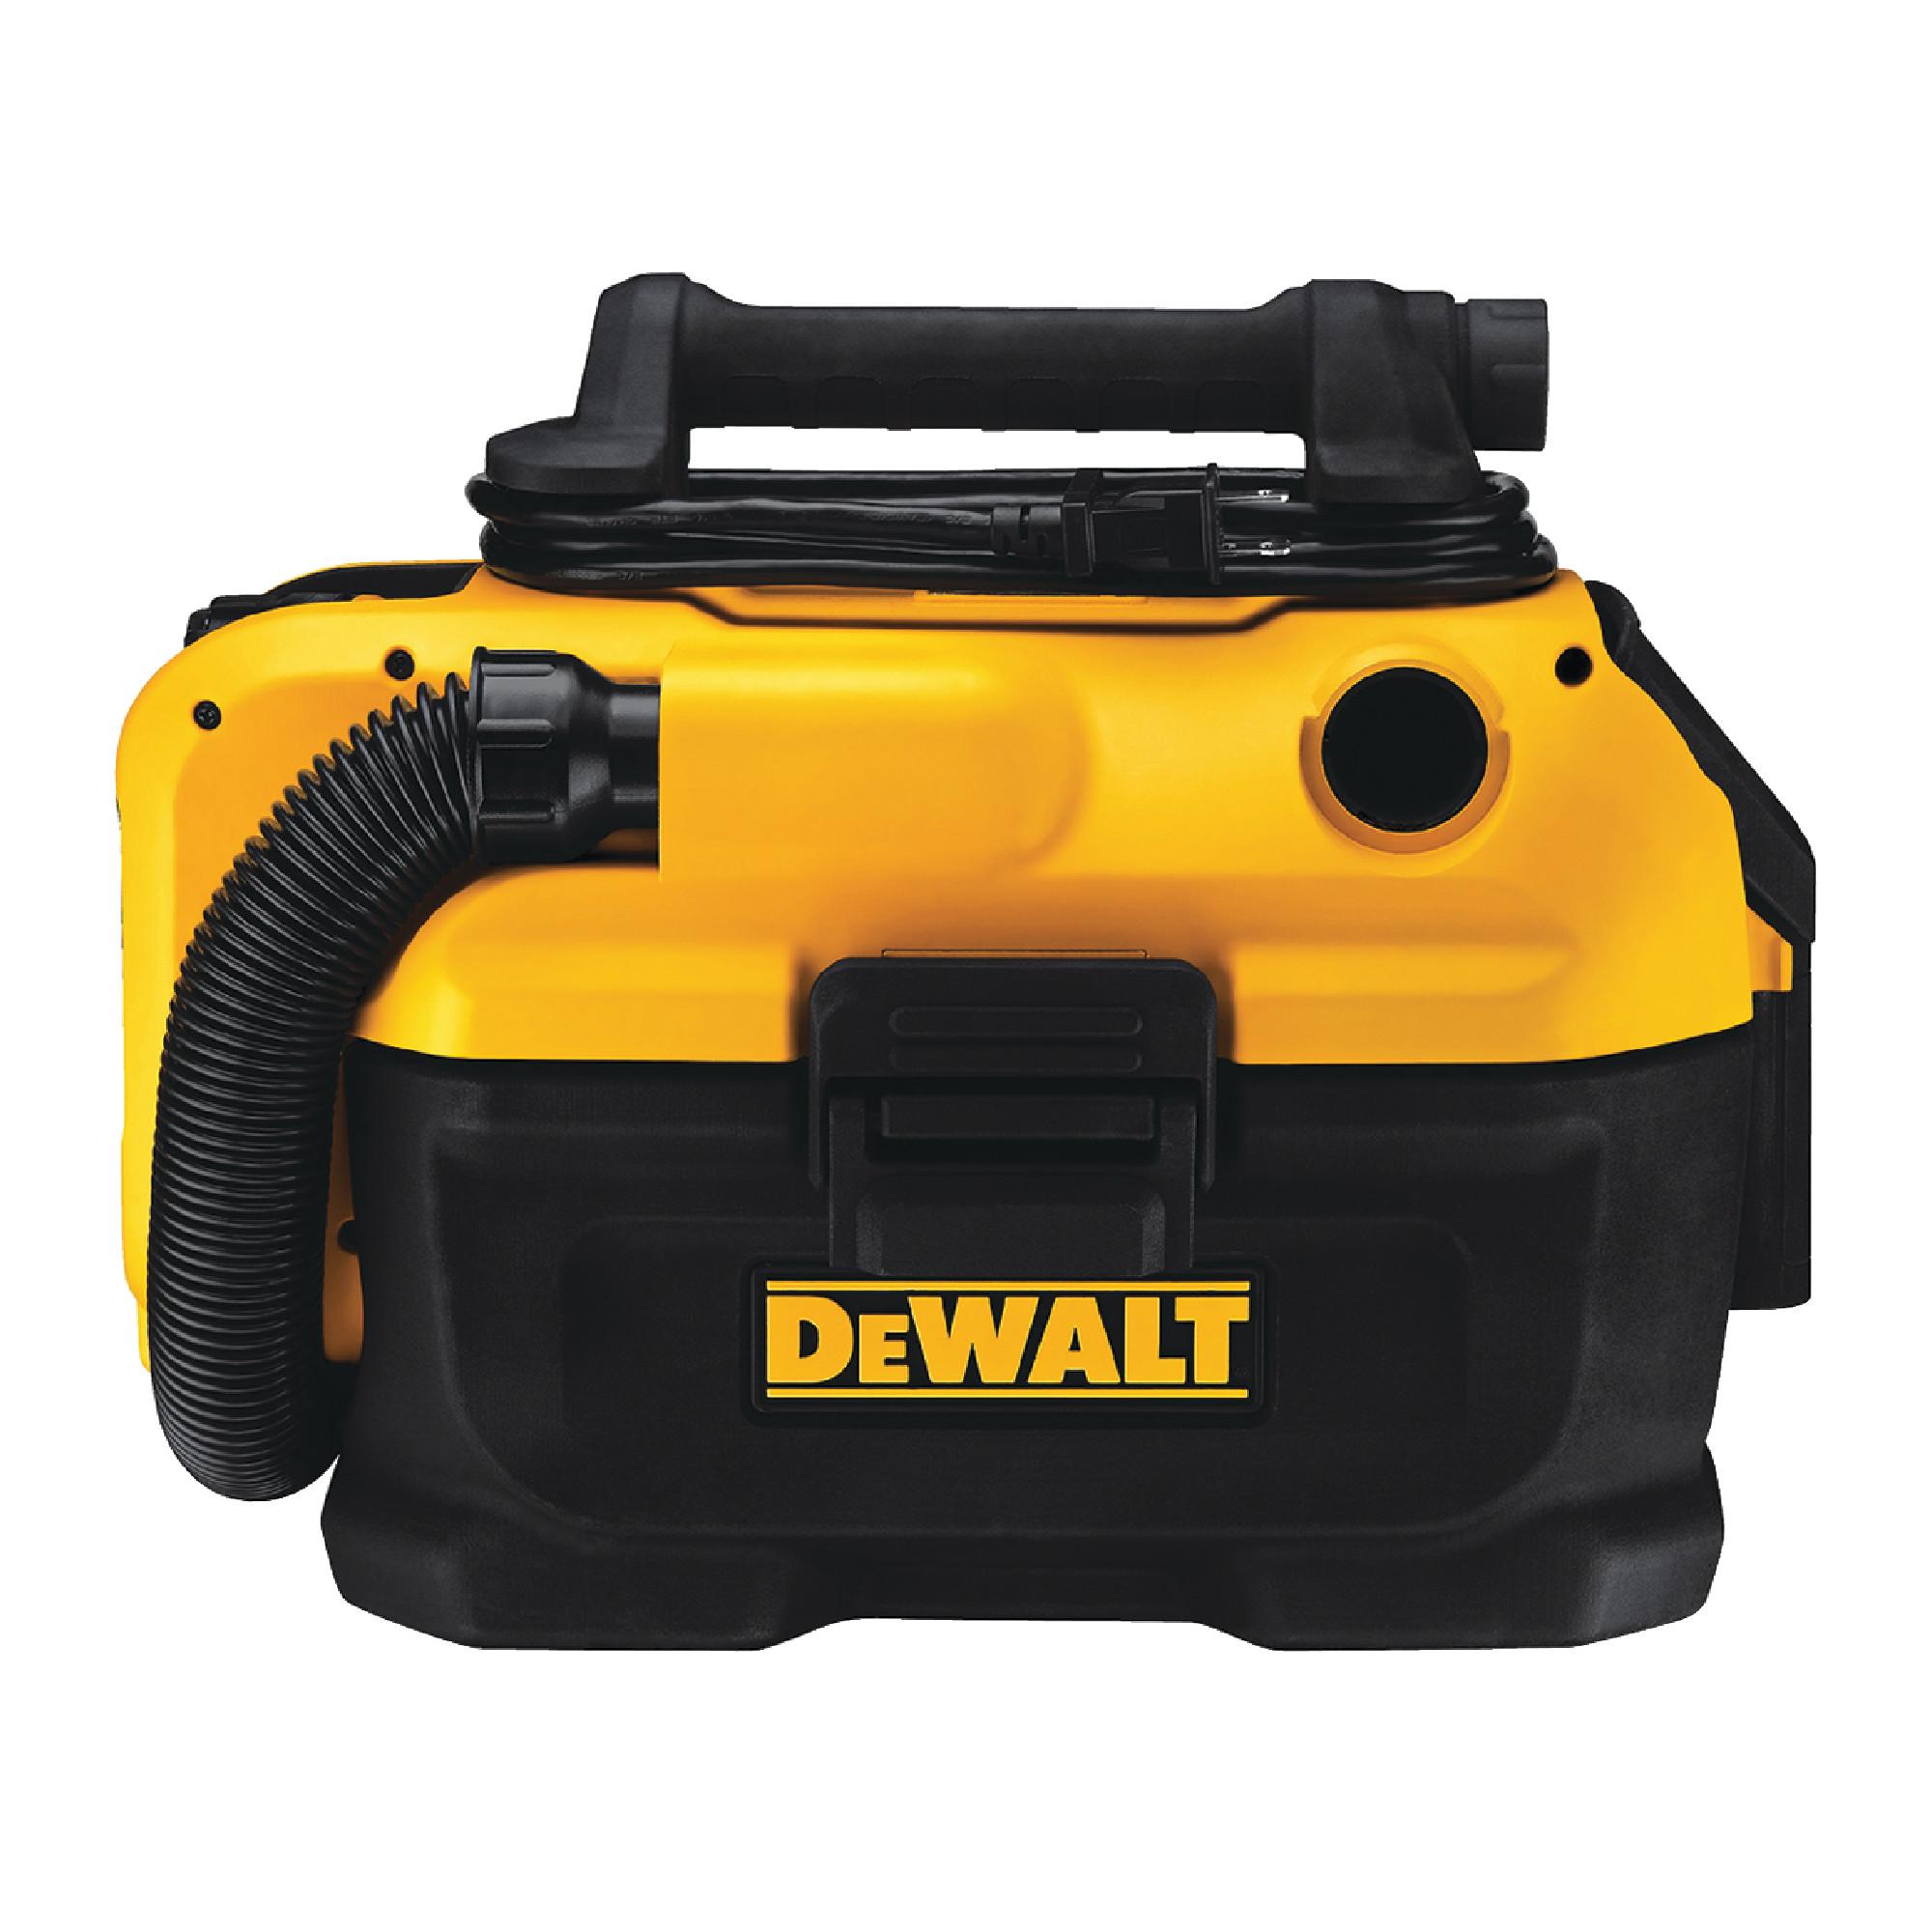 Contractor Portable Wet/Dry Vac